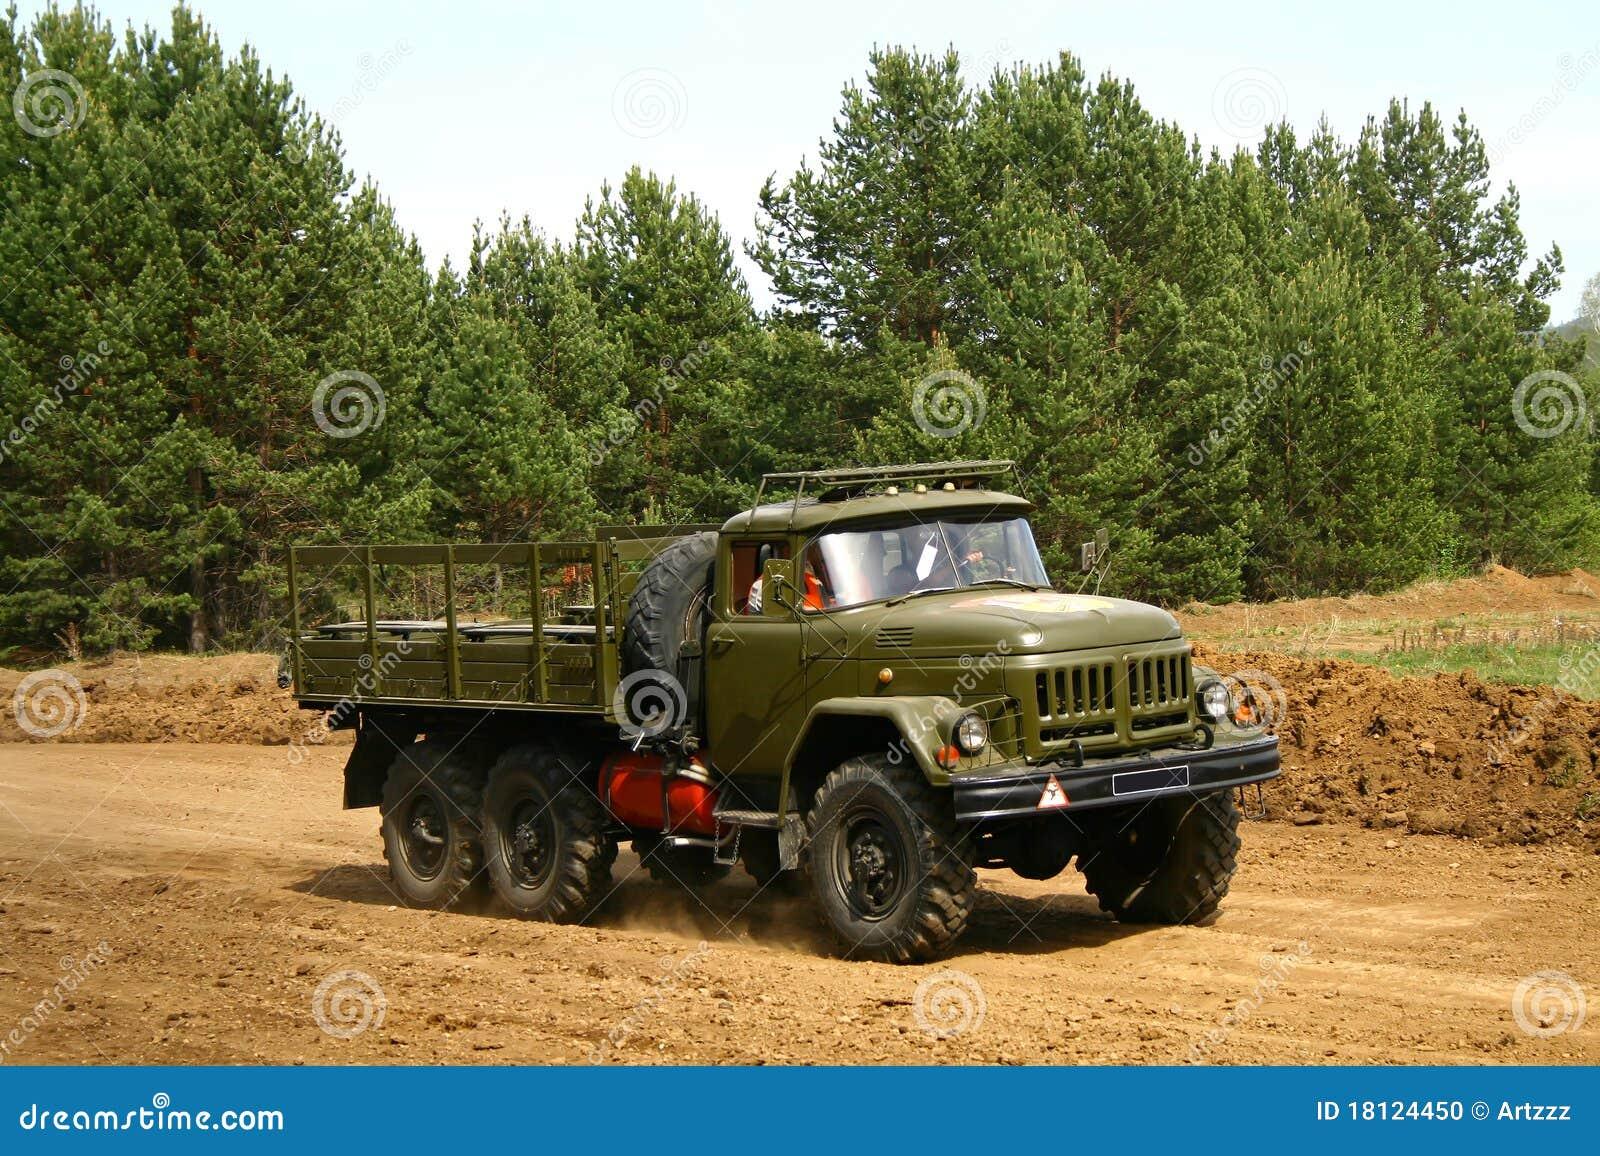 camion militaire photo stock image du for t roue r tro 18124450. Black Bedroom Furniture Sets. Home Design Ideas